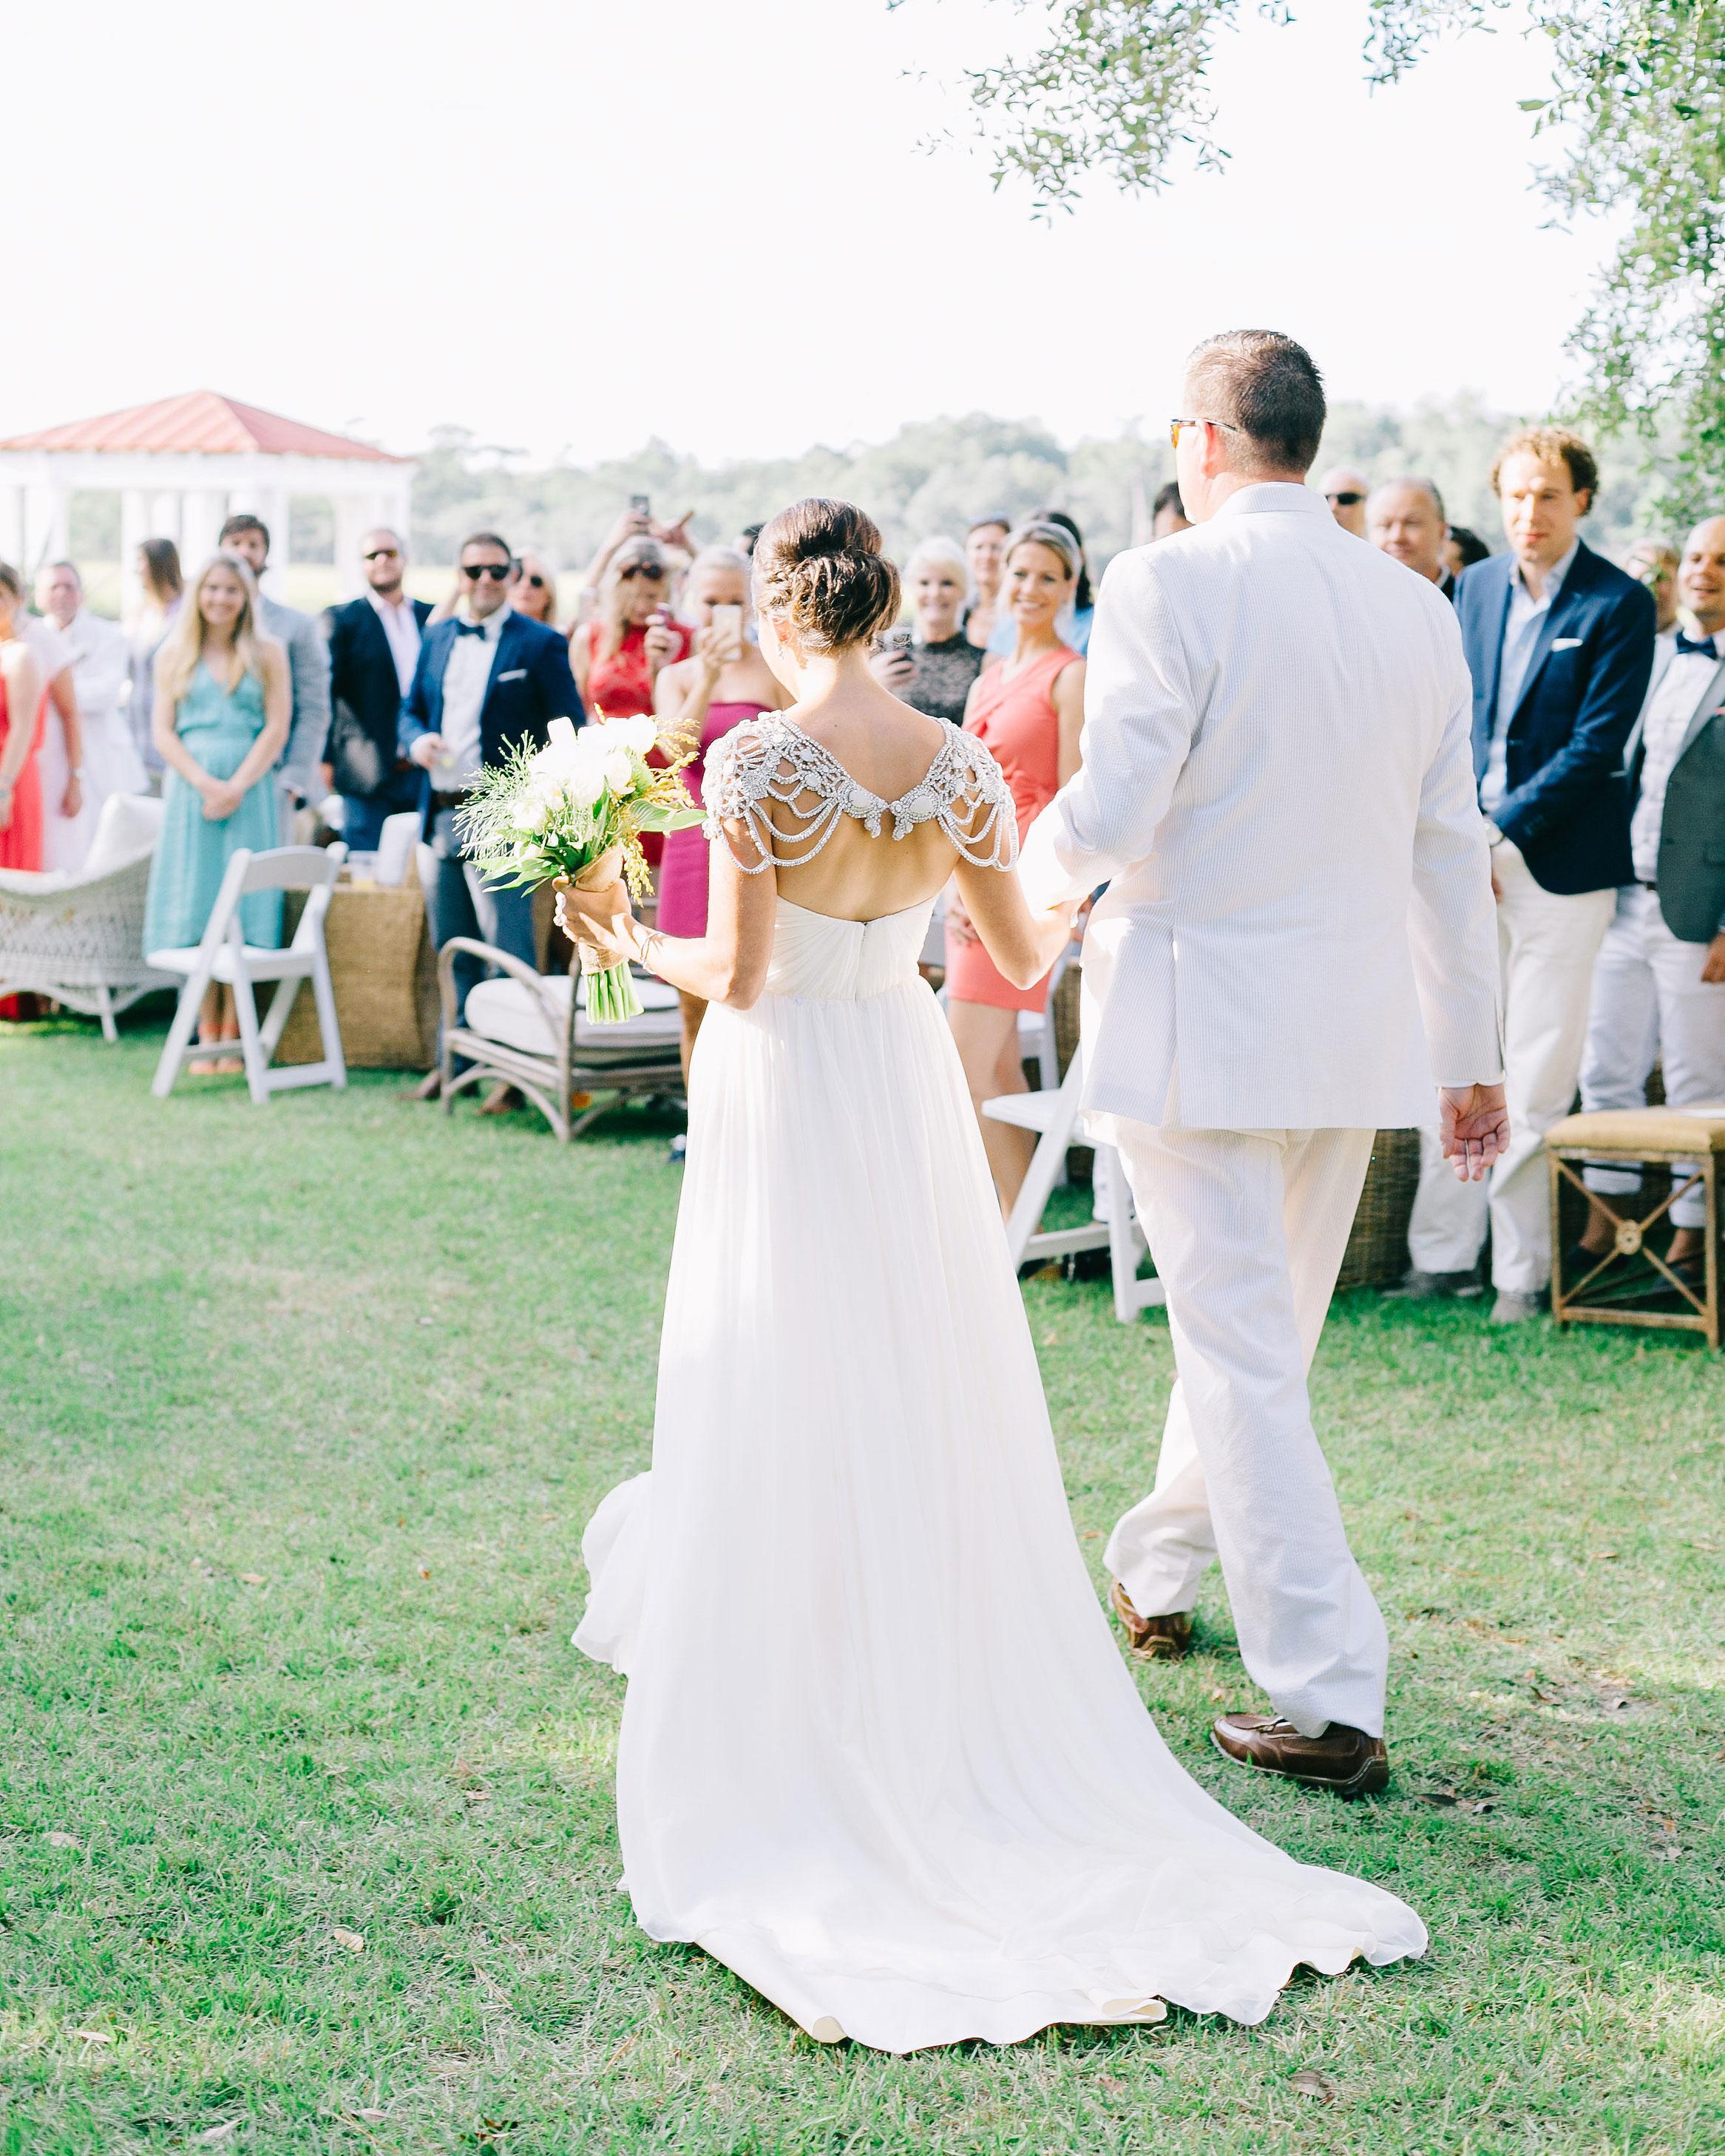 rachel-jurrie-nautical-wedding-entrance-0451-s112778-0416.jpg